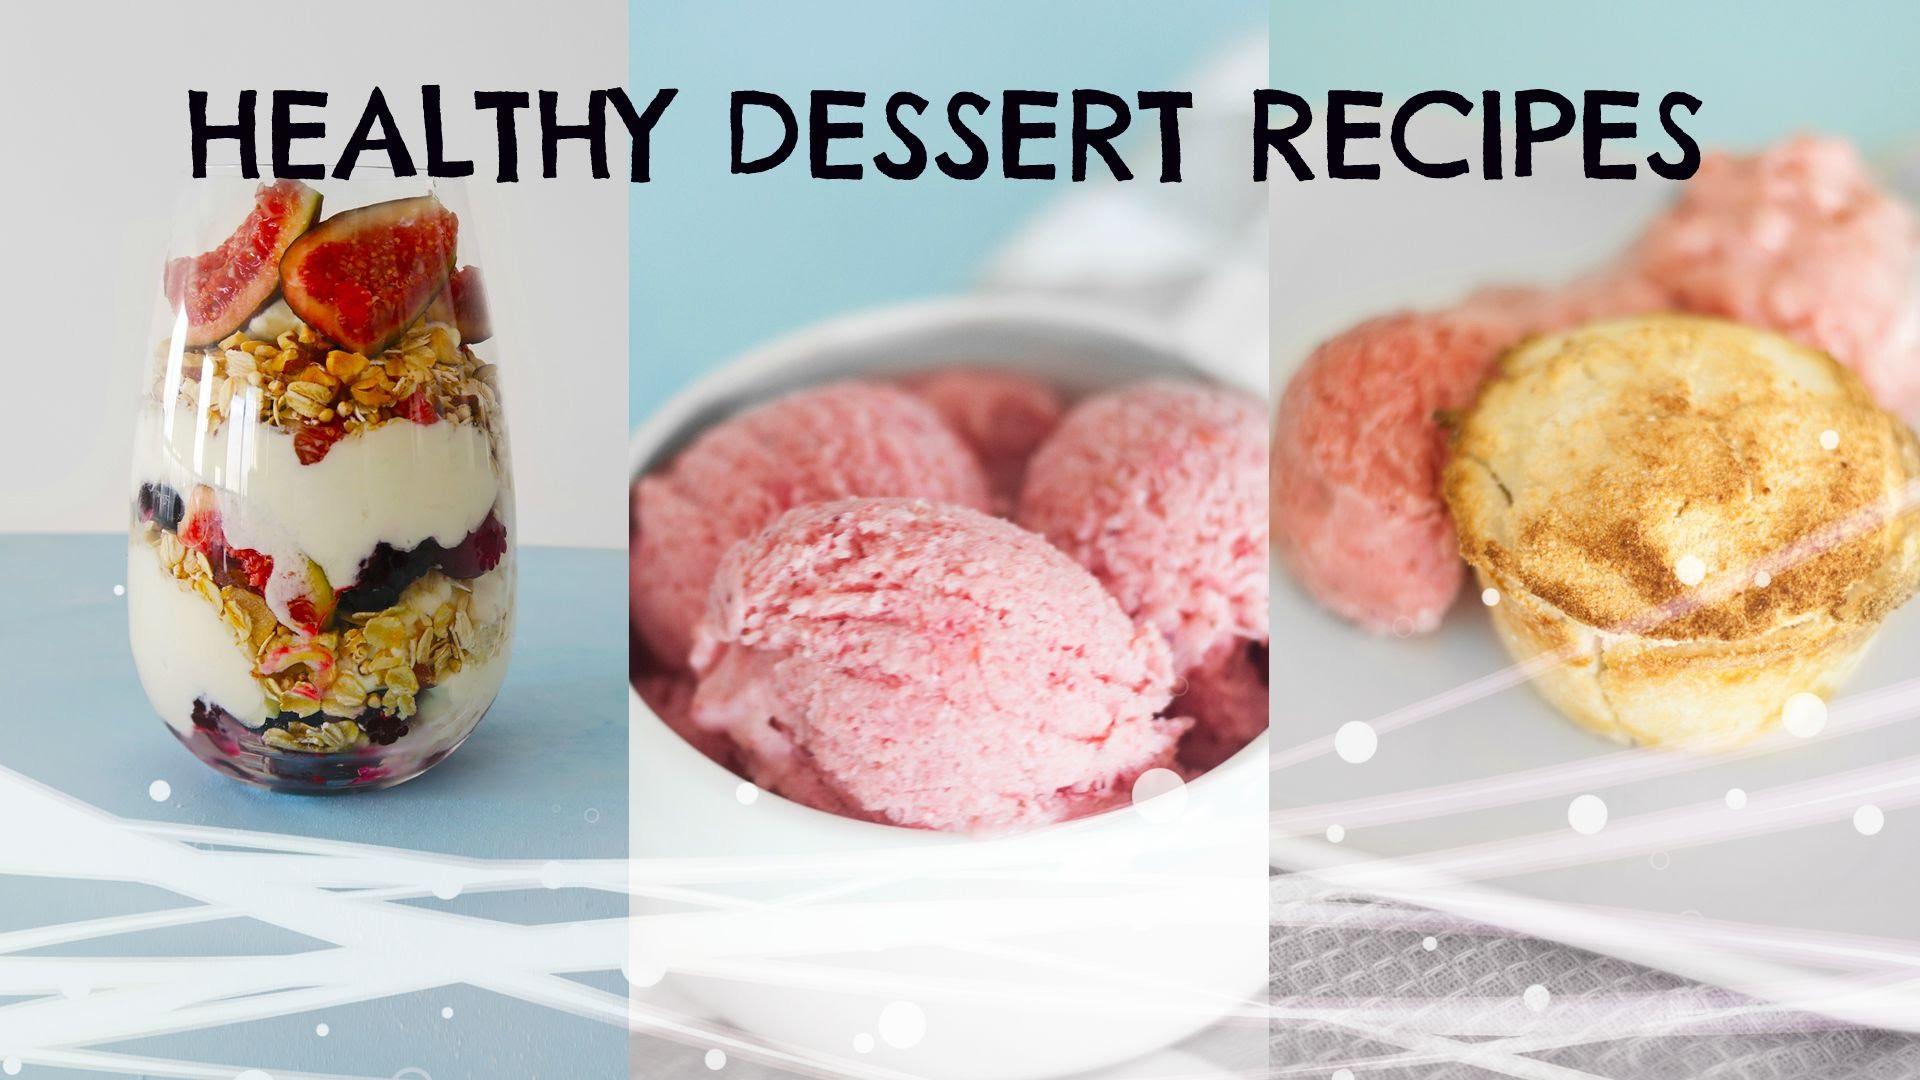 Easy Healthy Dessert Recipes  Healthy DESSERT Recipes simple sweets Rachel Aust